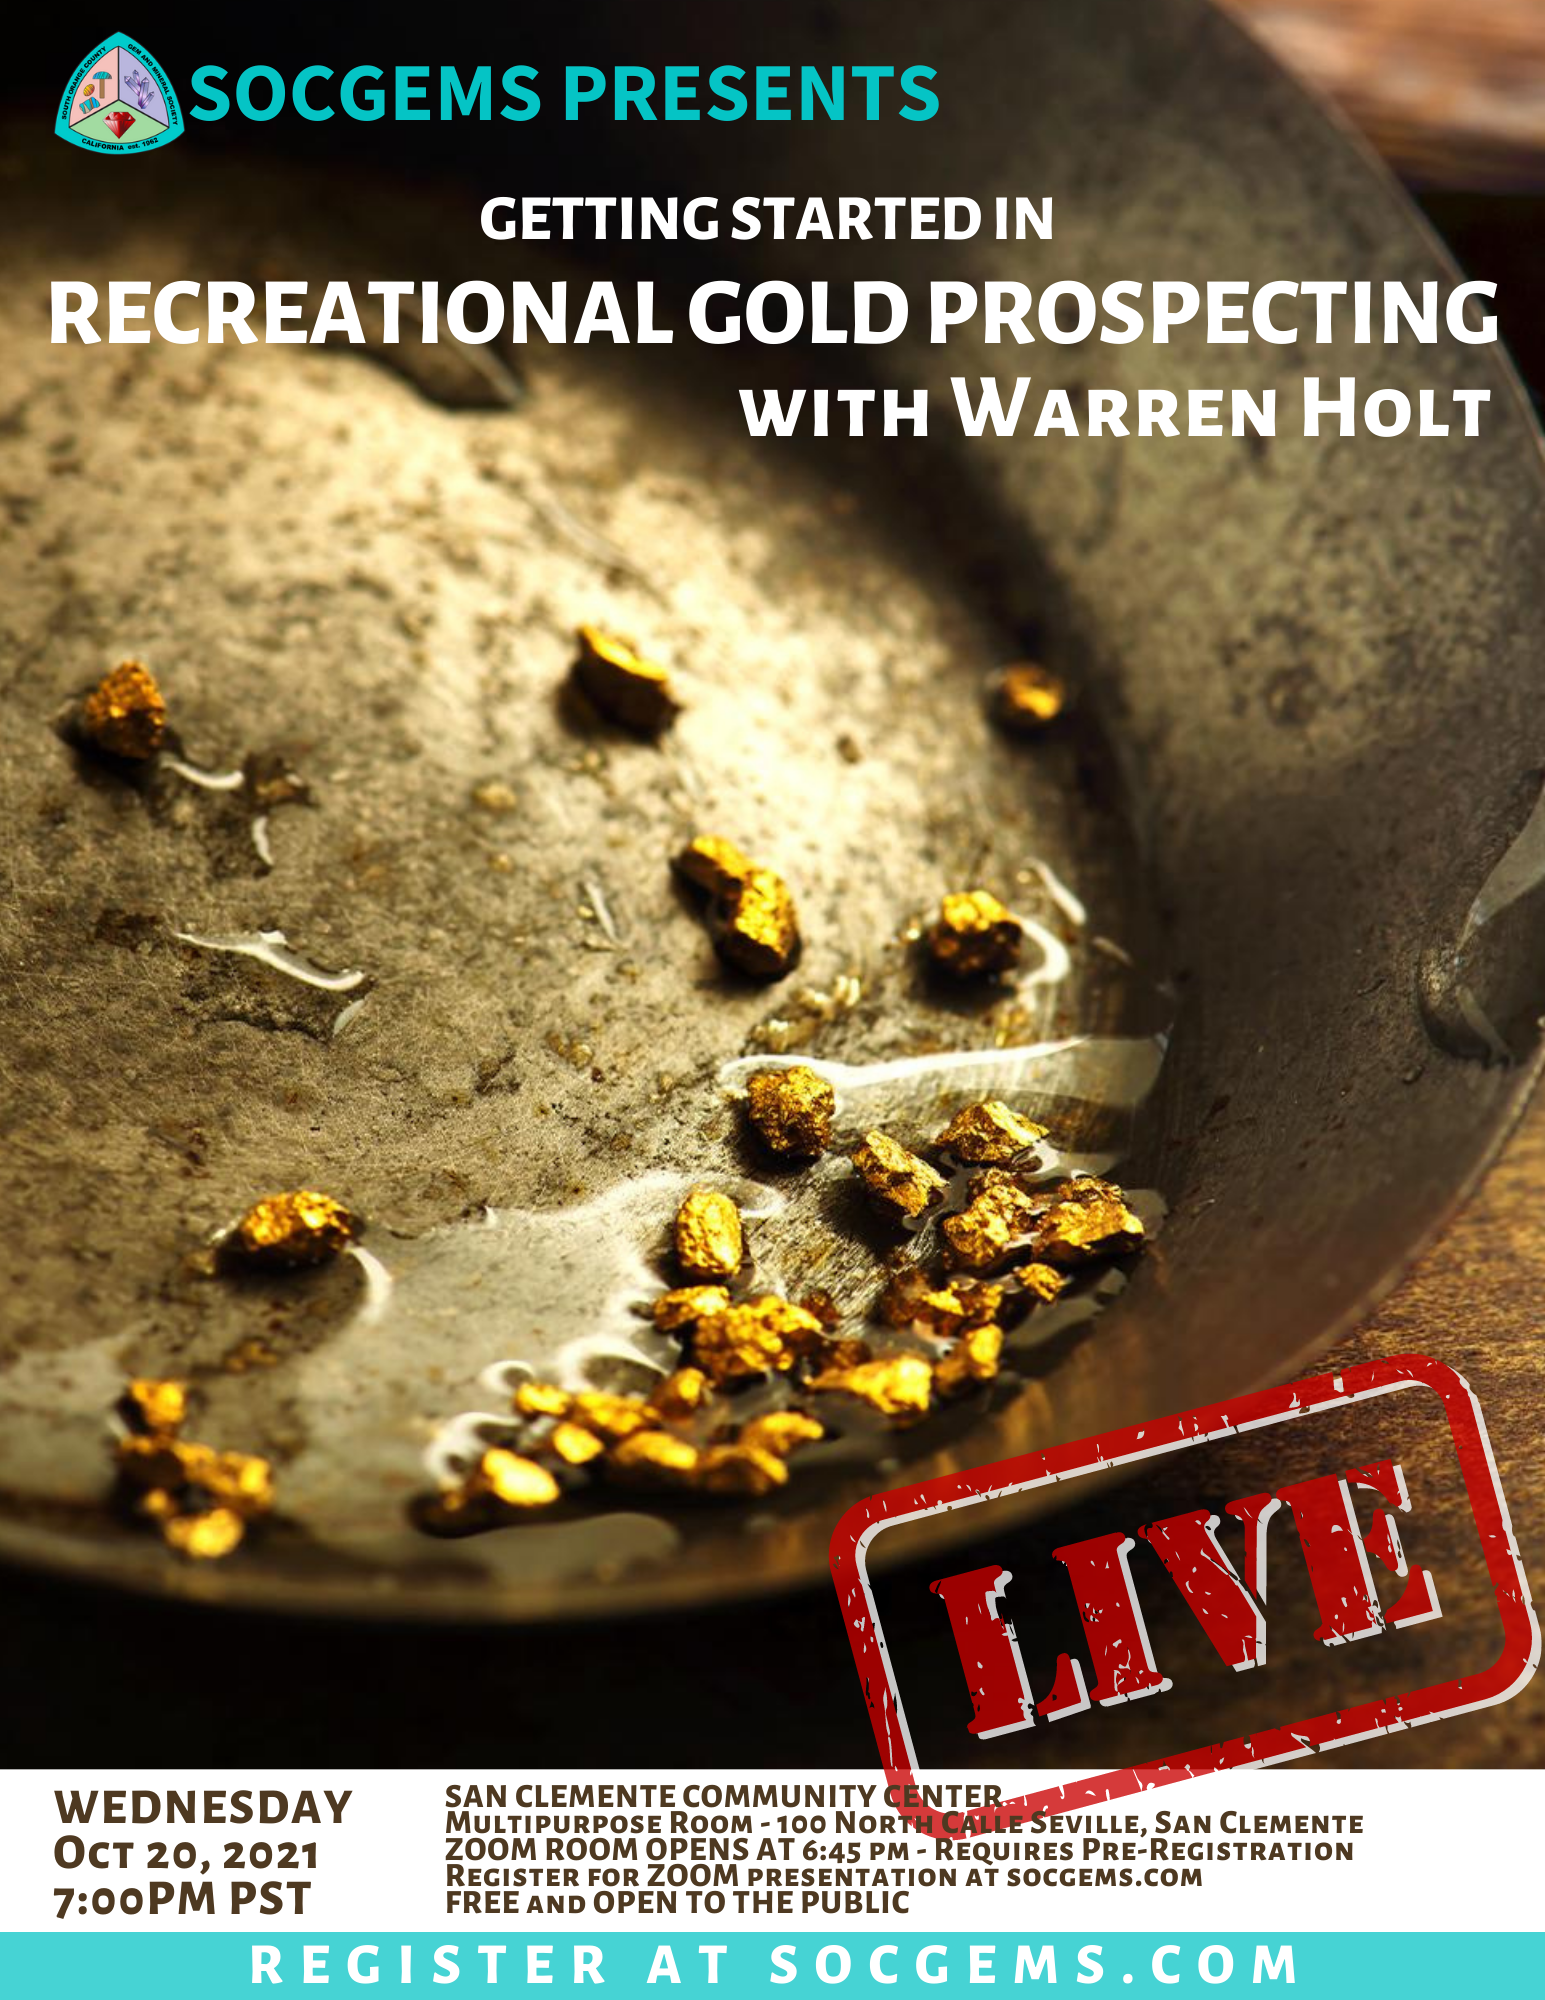 recreational gold prospectin